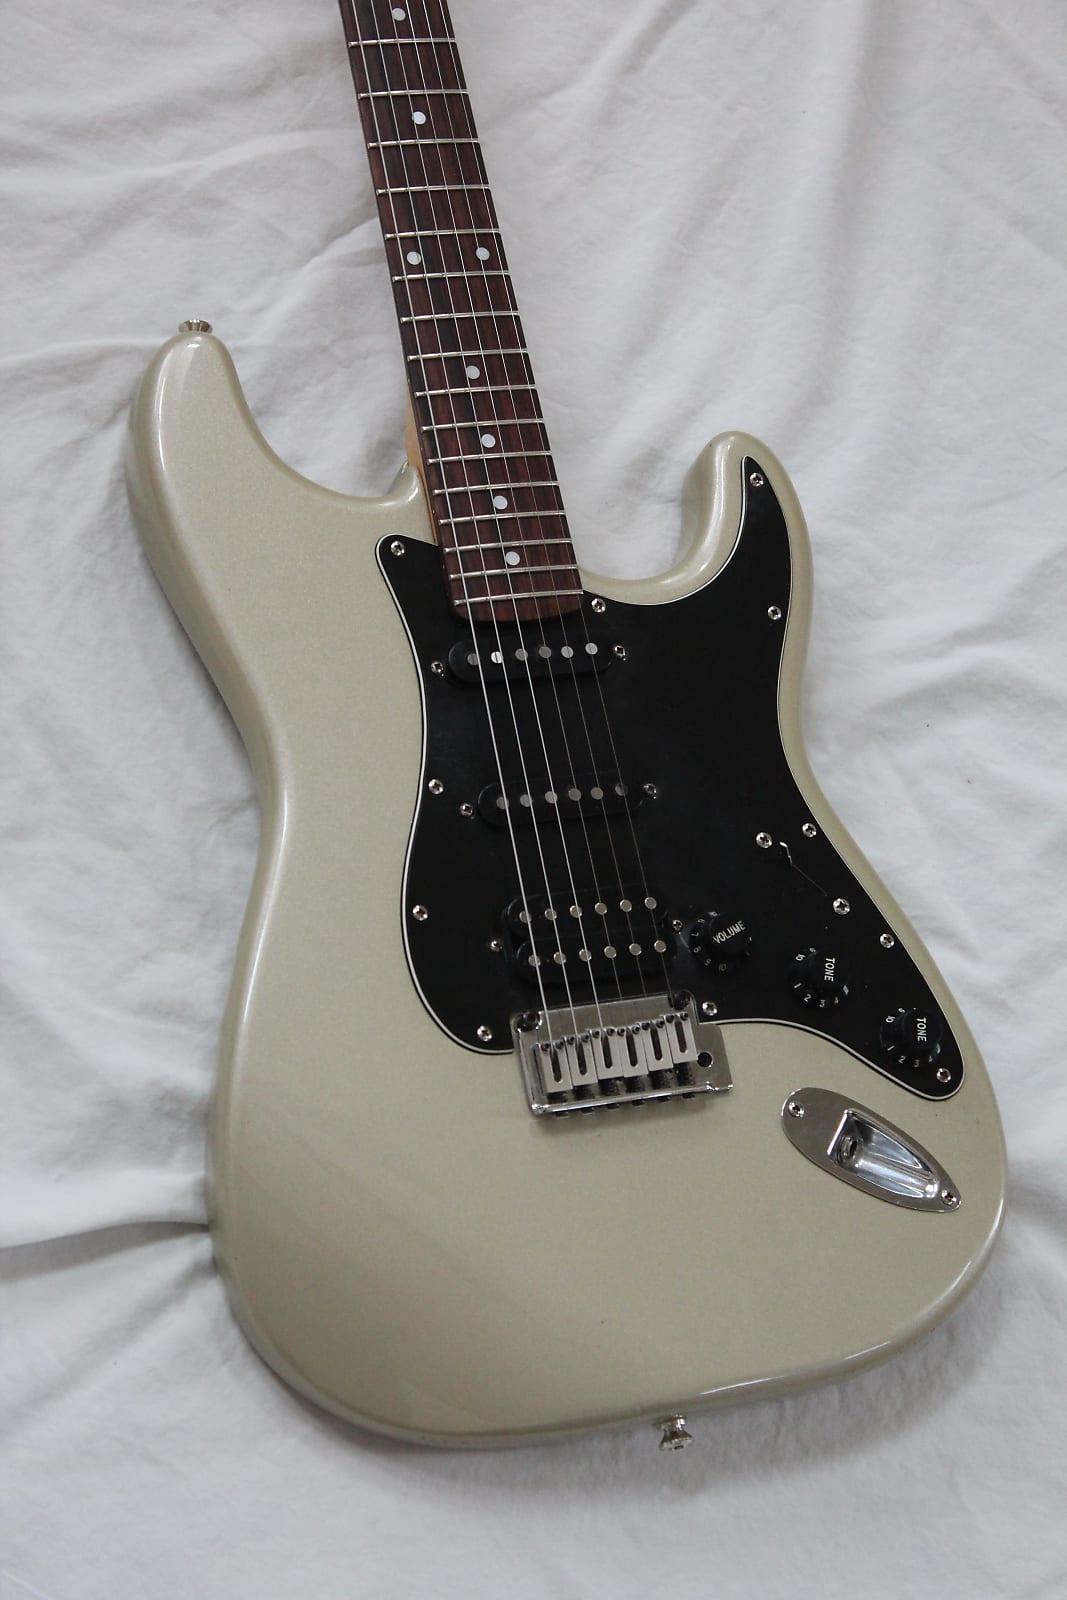 2001 Squier Stratocaster Standard Series Guitar 2 Point Trem - Shoreline  Gold Finish